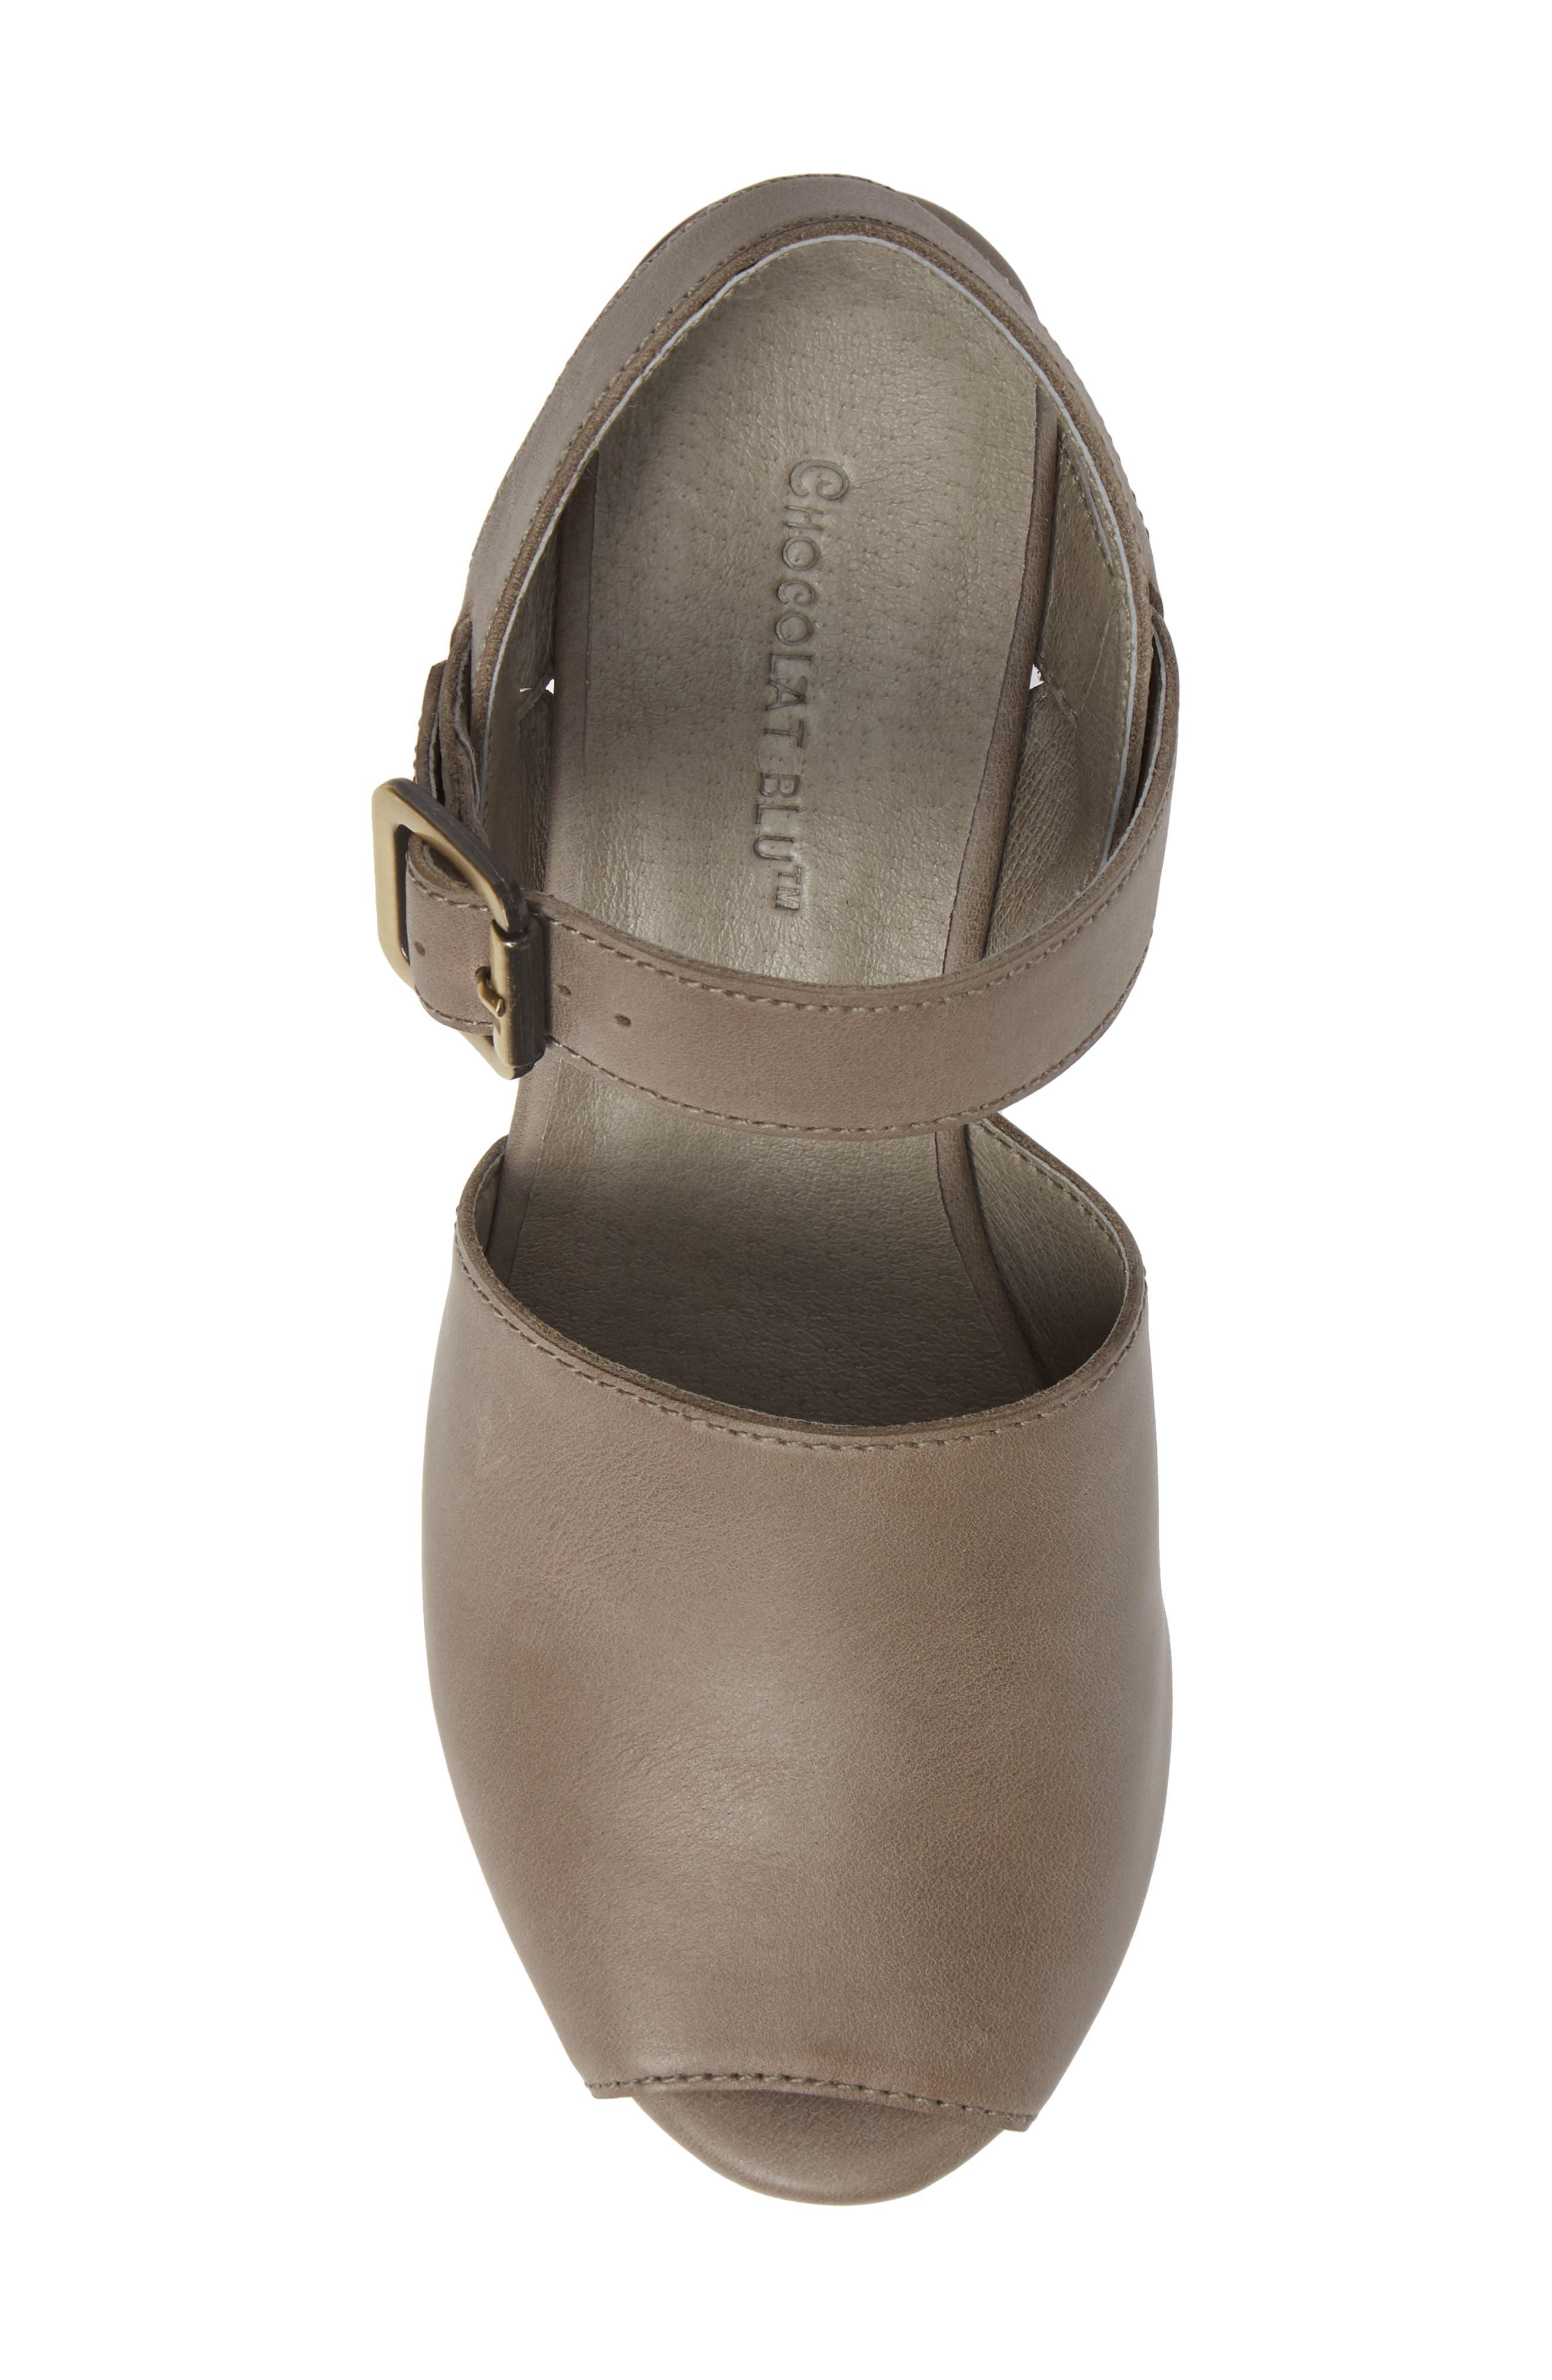 Wagga Platform Wedge Sandal,                             Alternate thumbnail 5, color,                             GREY LEATHER